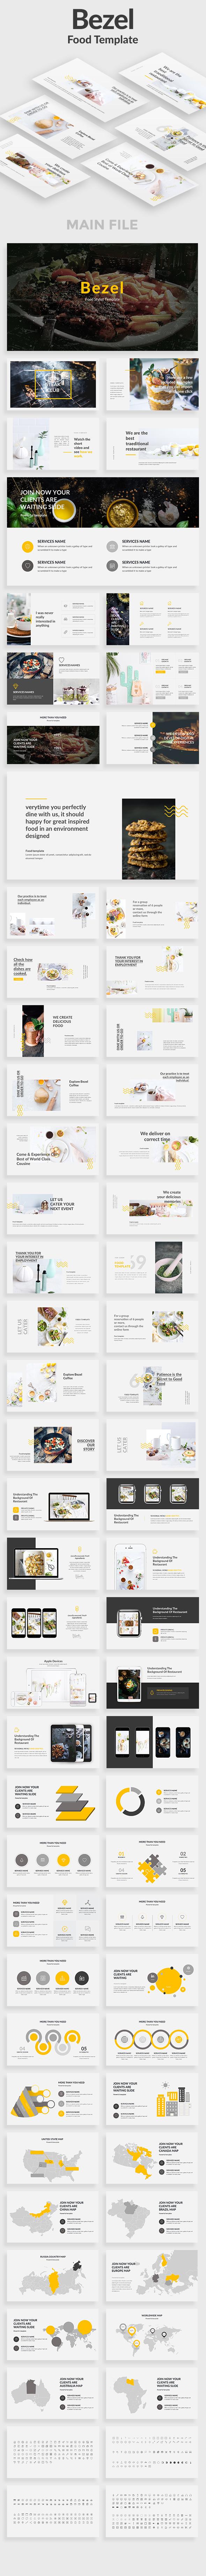 Bezel Food Powerpoint Template - Creative PowerPoint Templates